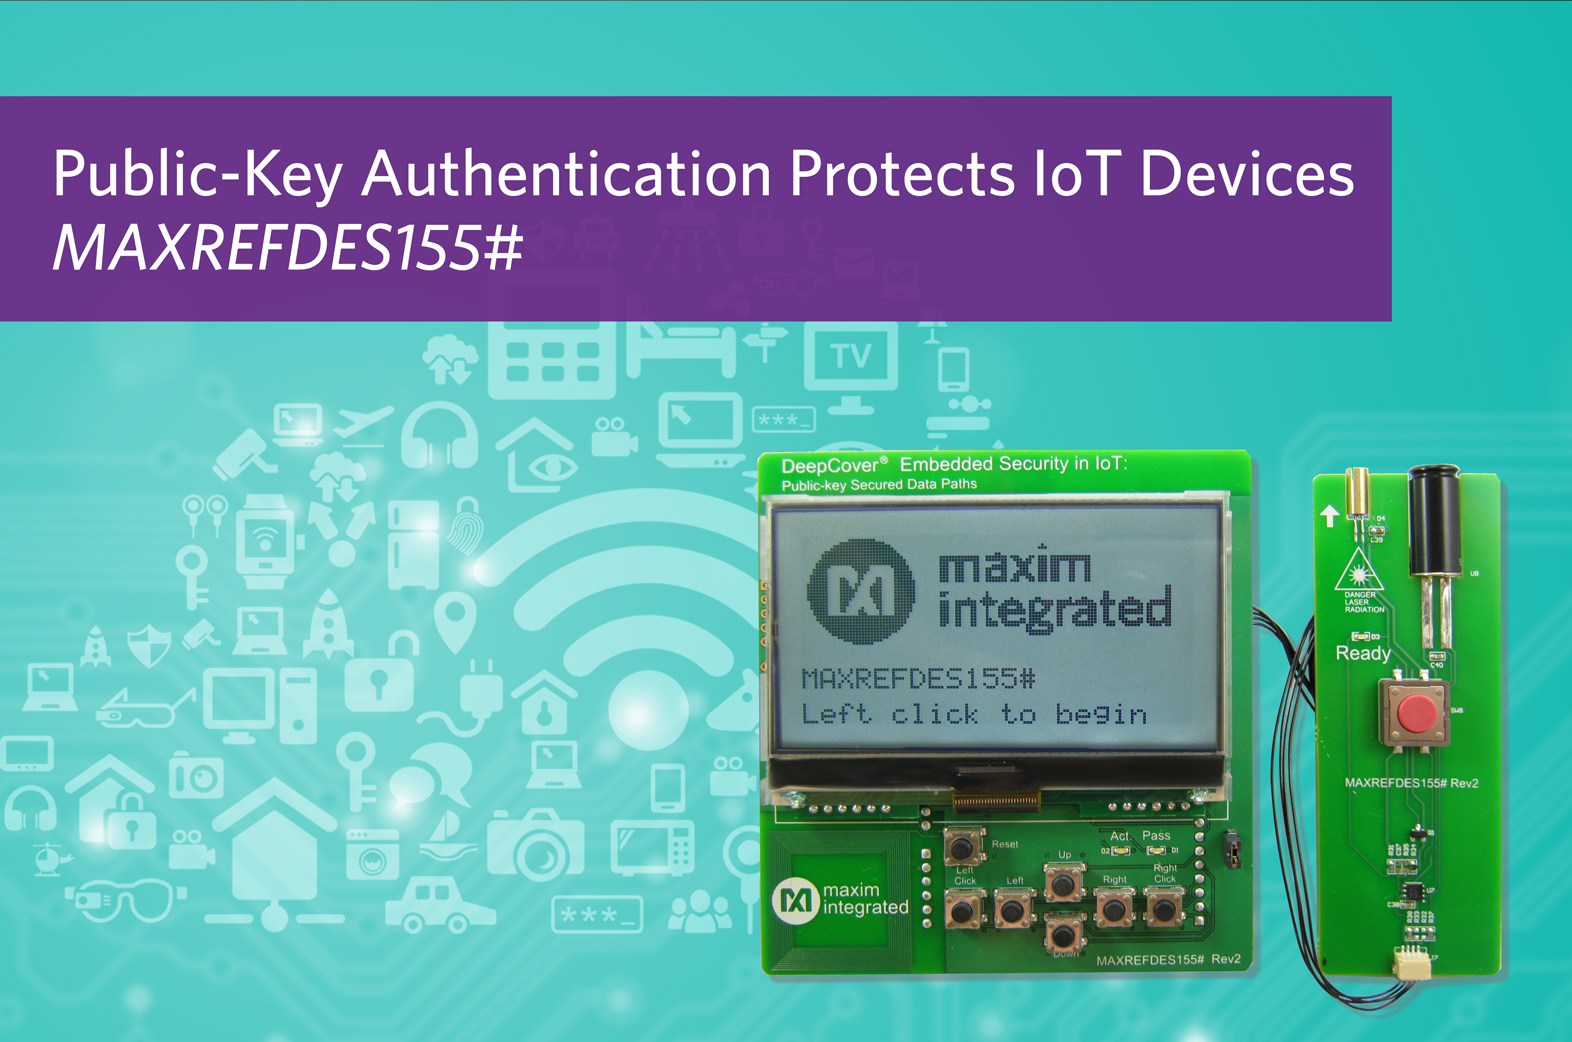 Maxim最新嵌入式安全平台轻松实现公钥加密,有效保护IoT设备和数据通路0